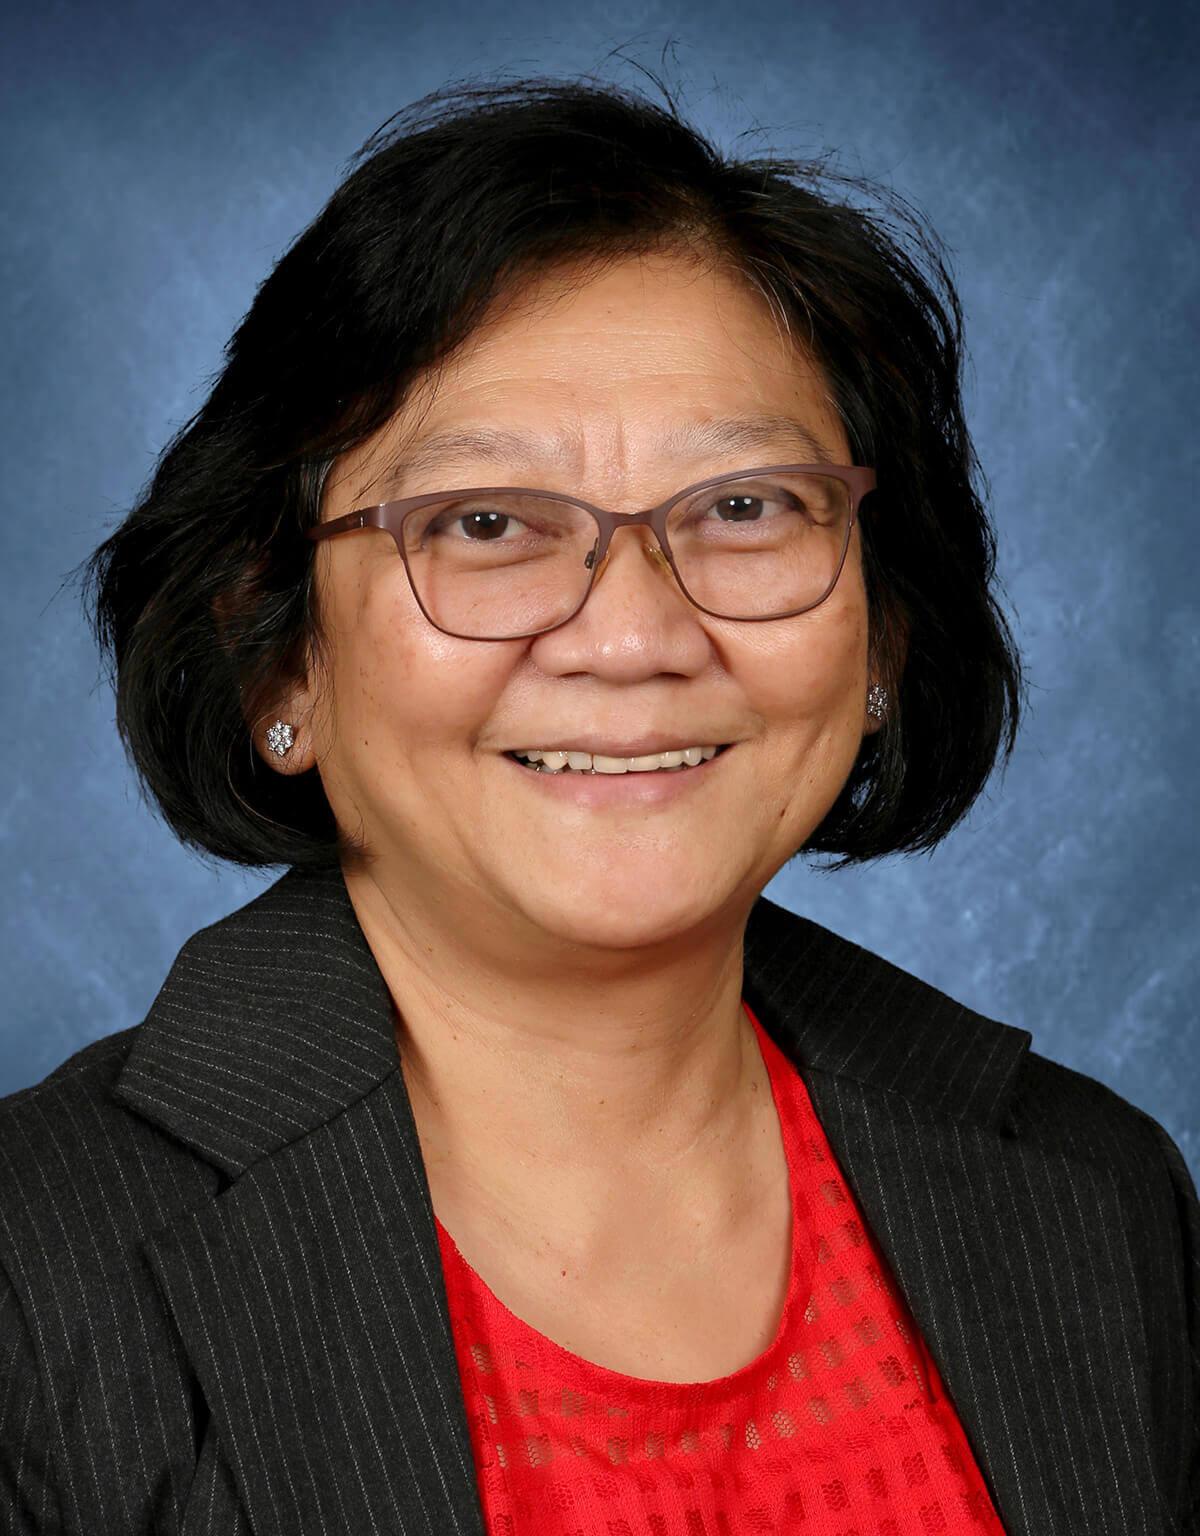 Wooiyi Yin headshot - long term health care services for seniors